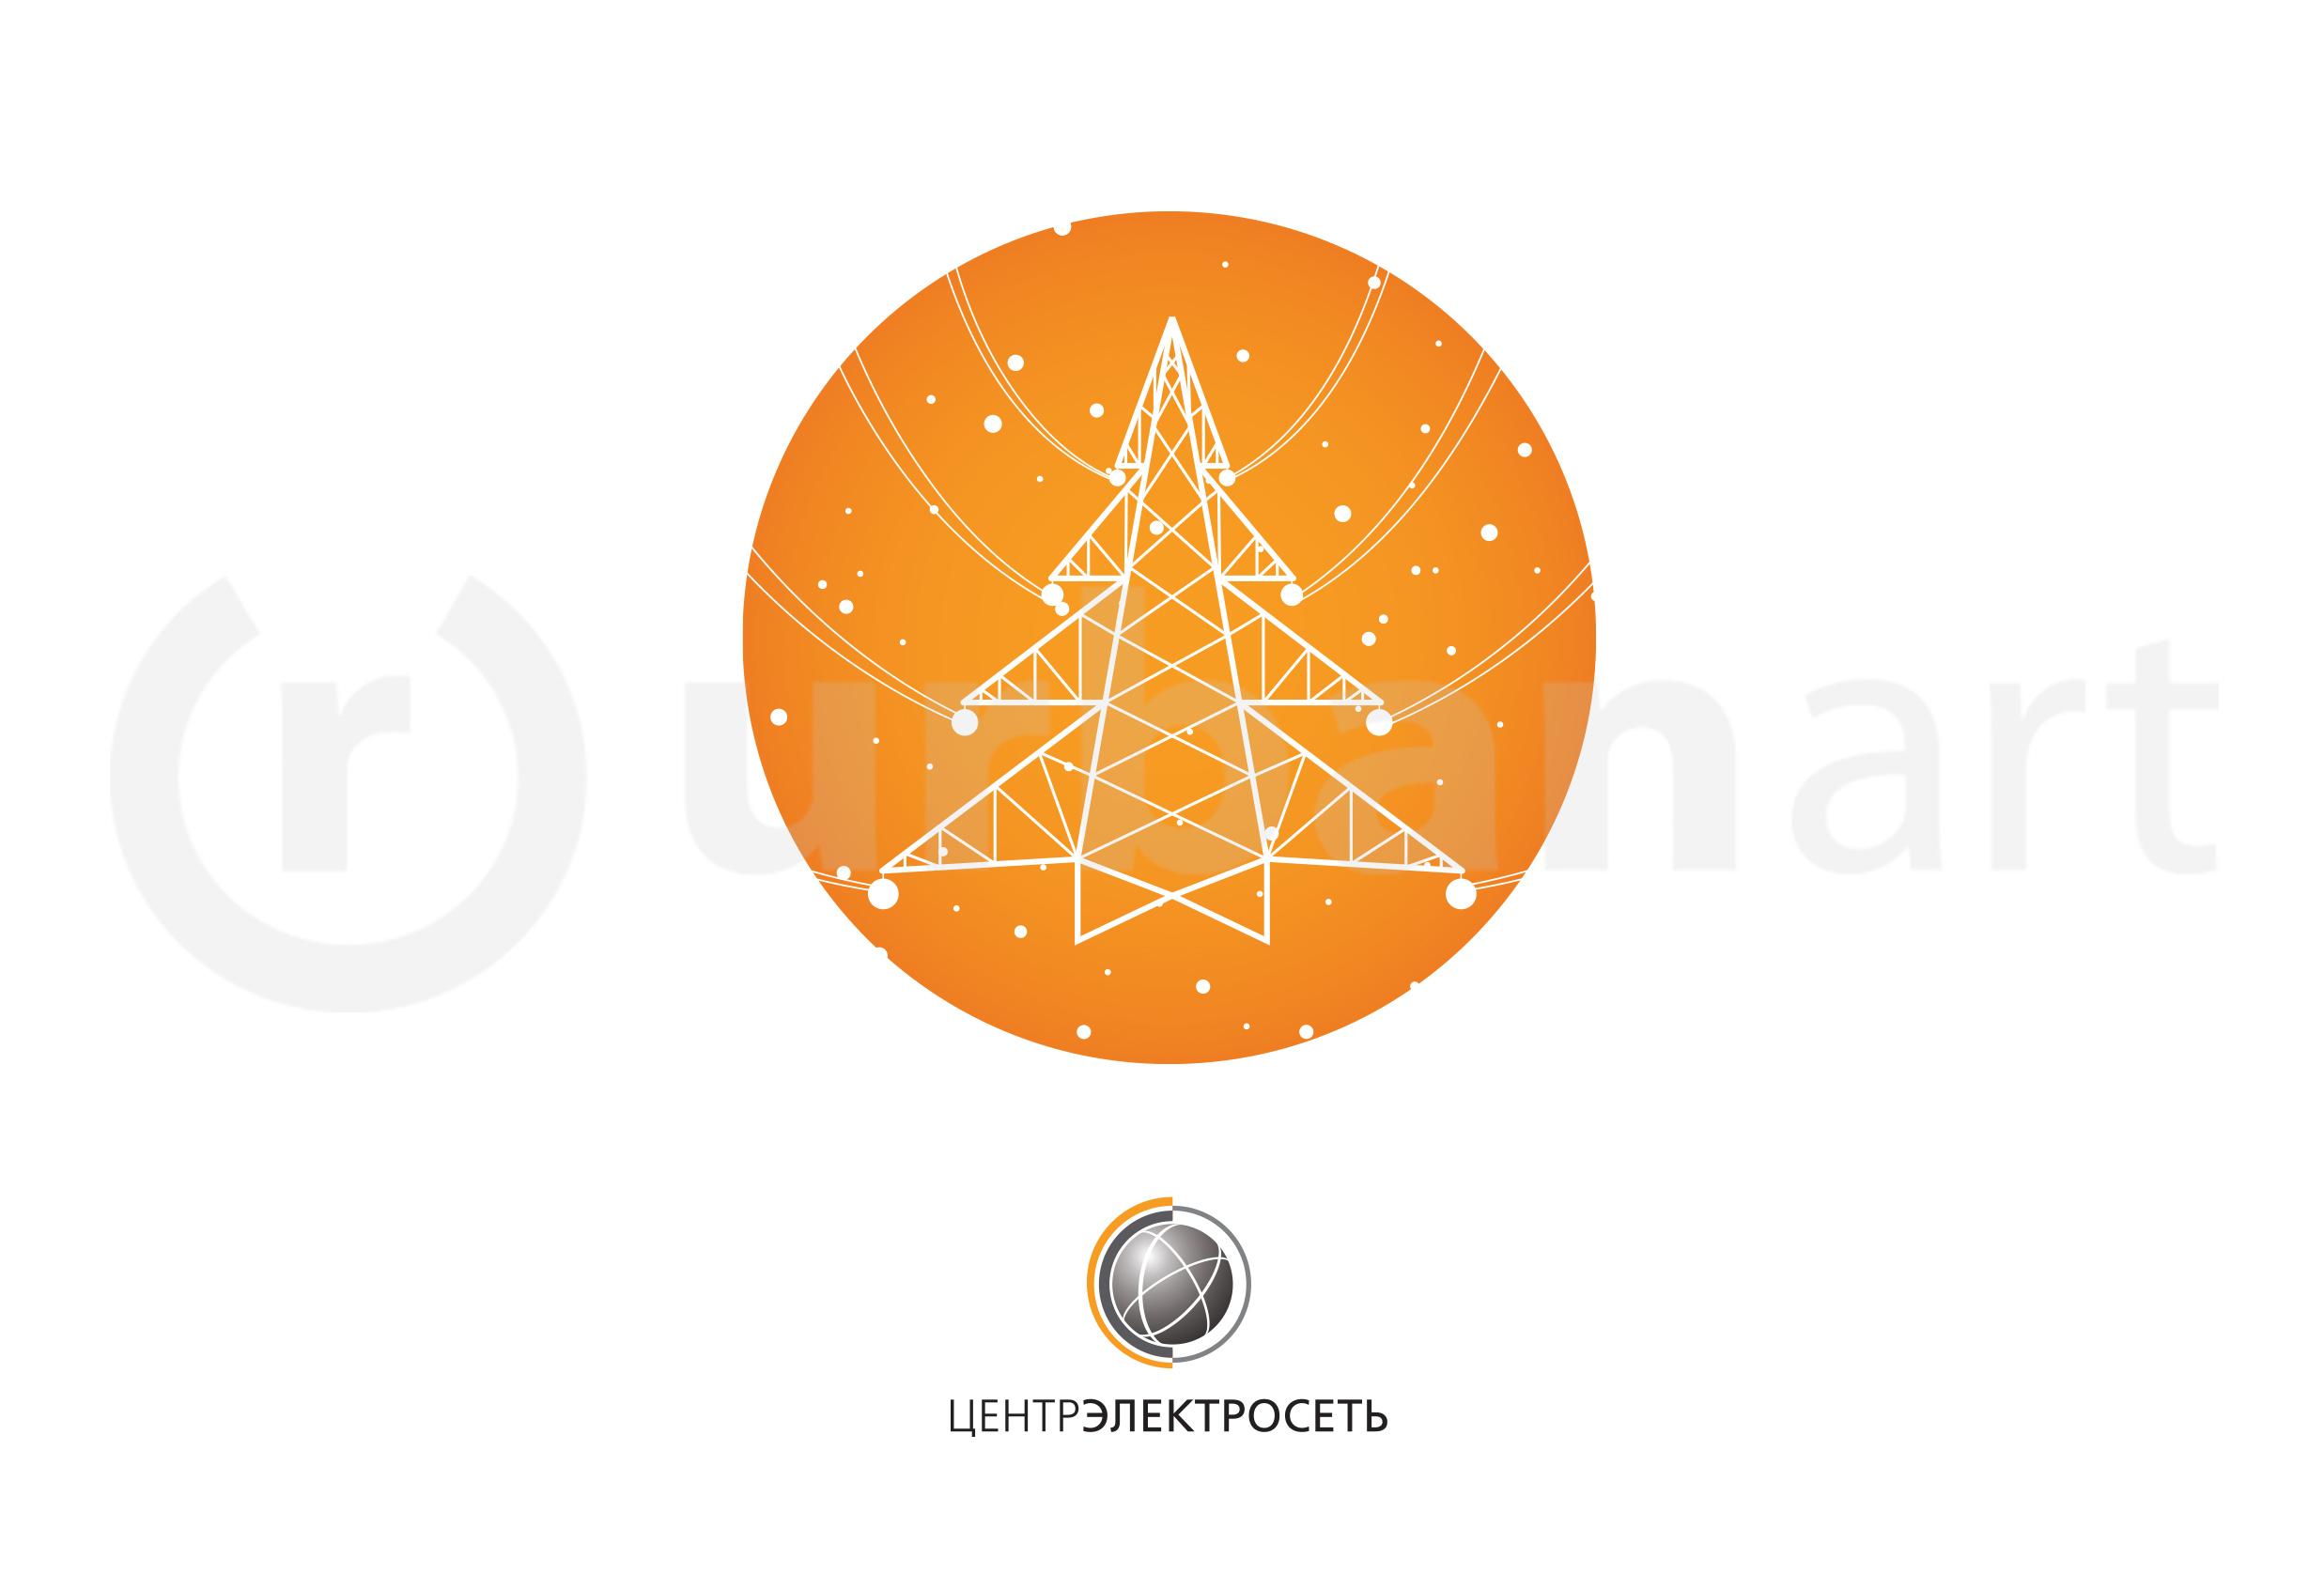 новогодних подарков компании Центр электро сети